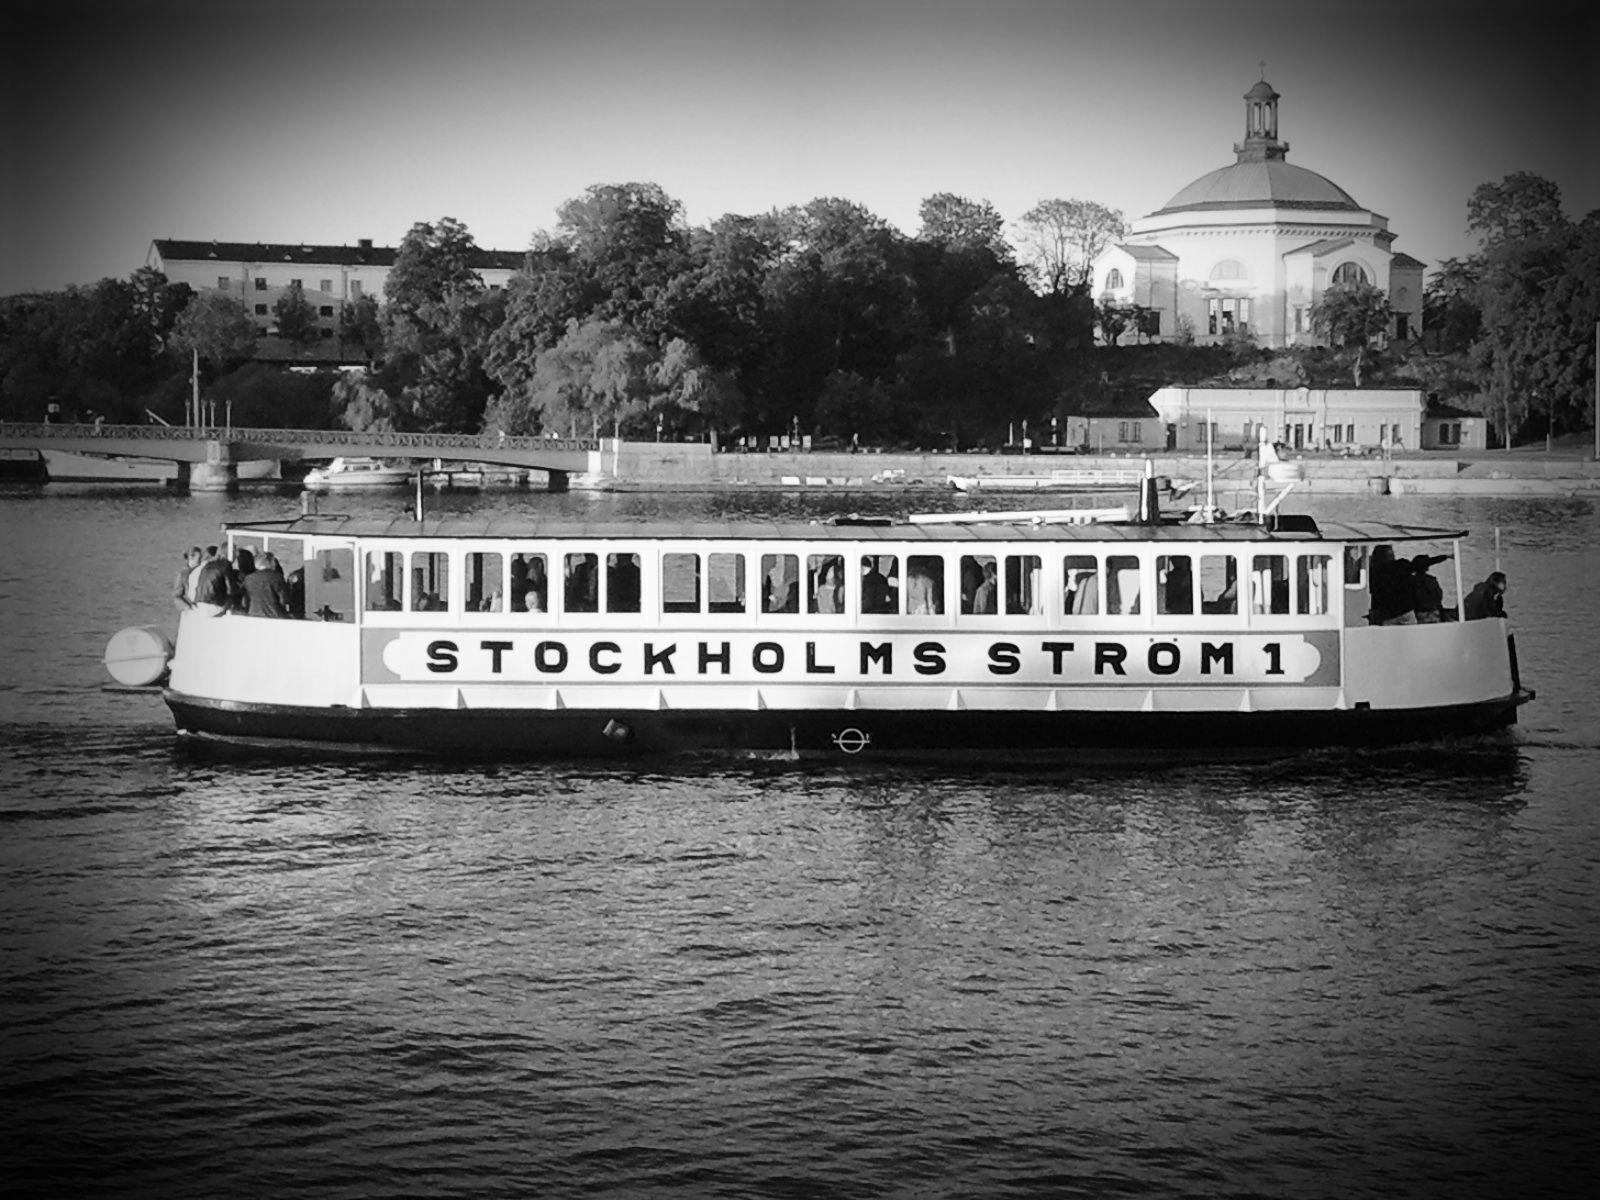 Stockholms ström 1